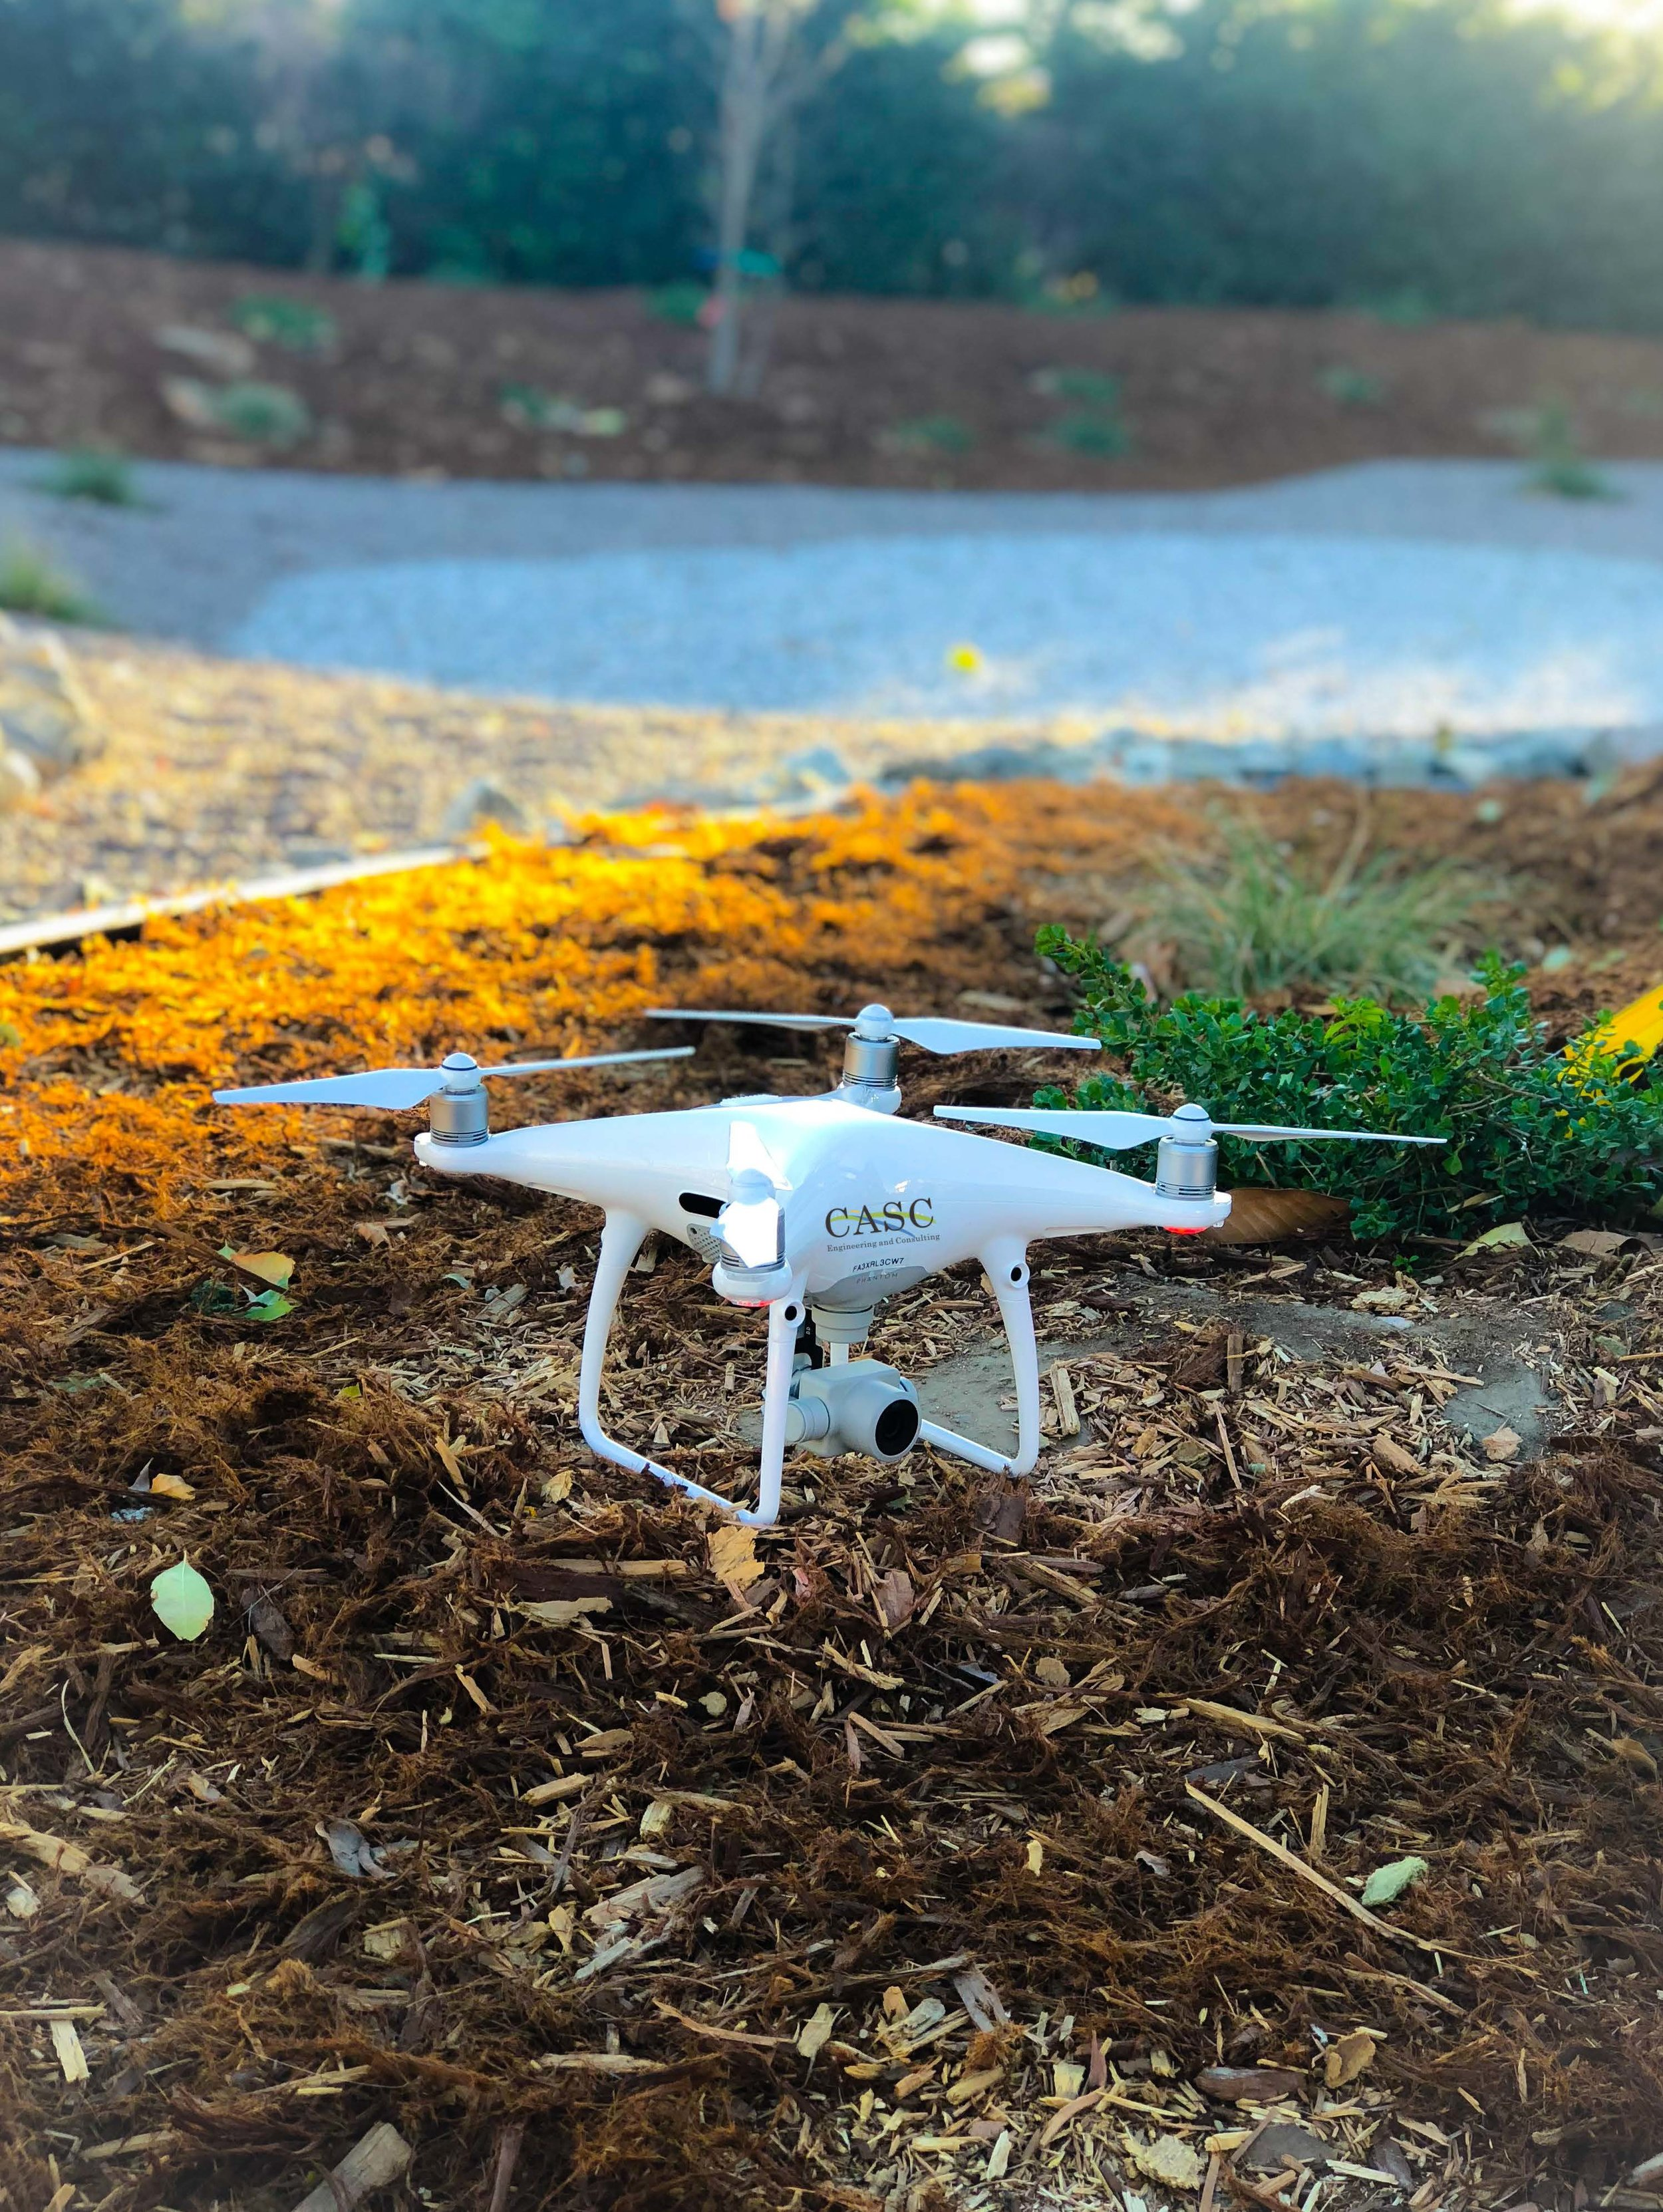 image of CASC drone taking flight.